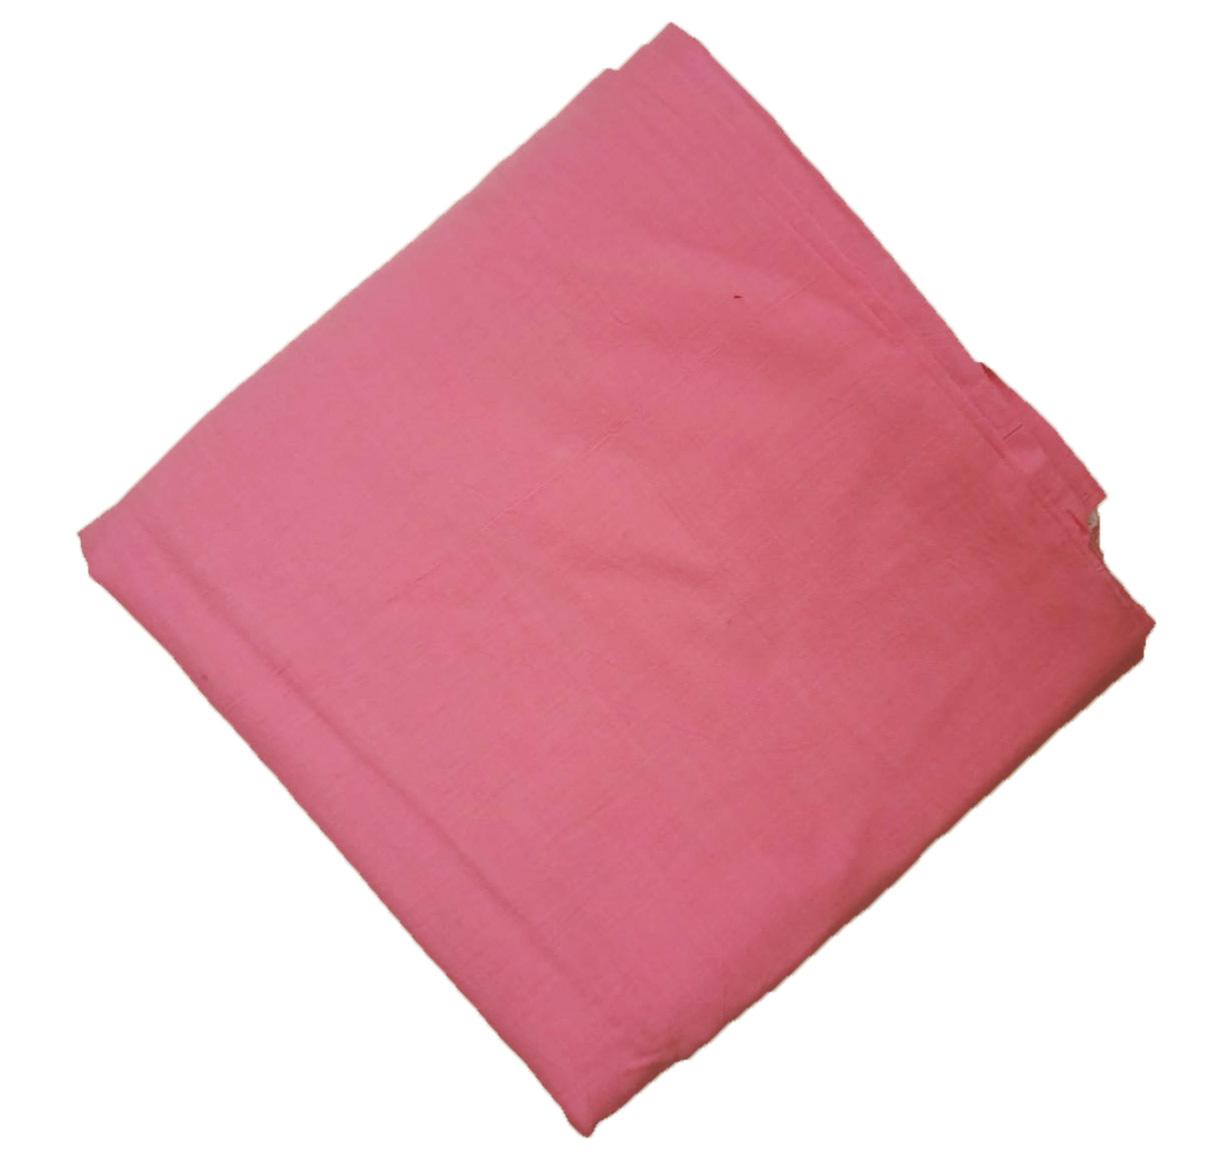 Pink Crush Cotton Dress Material Cutpiece CJ047 1